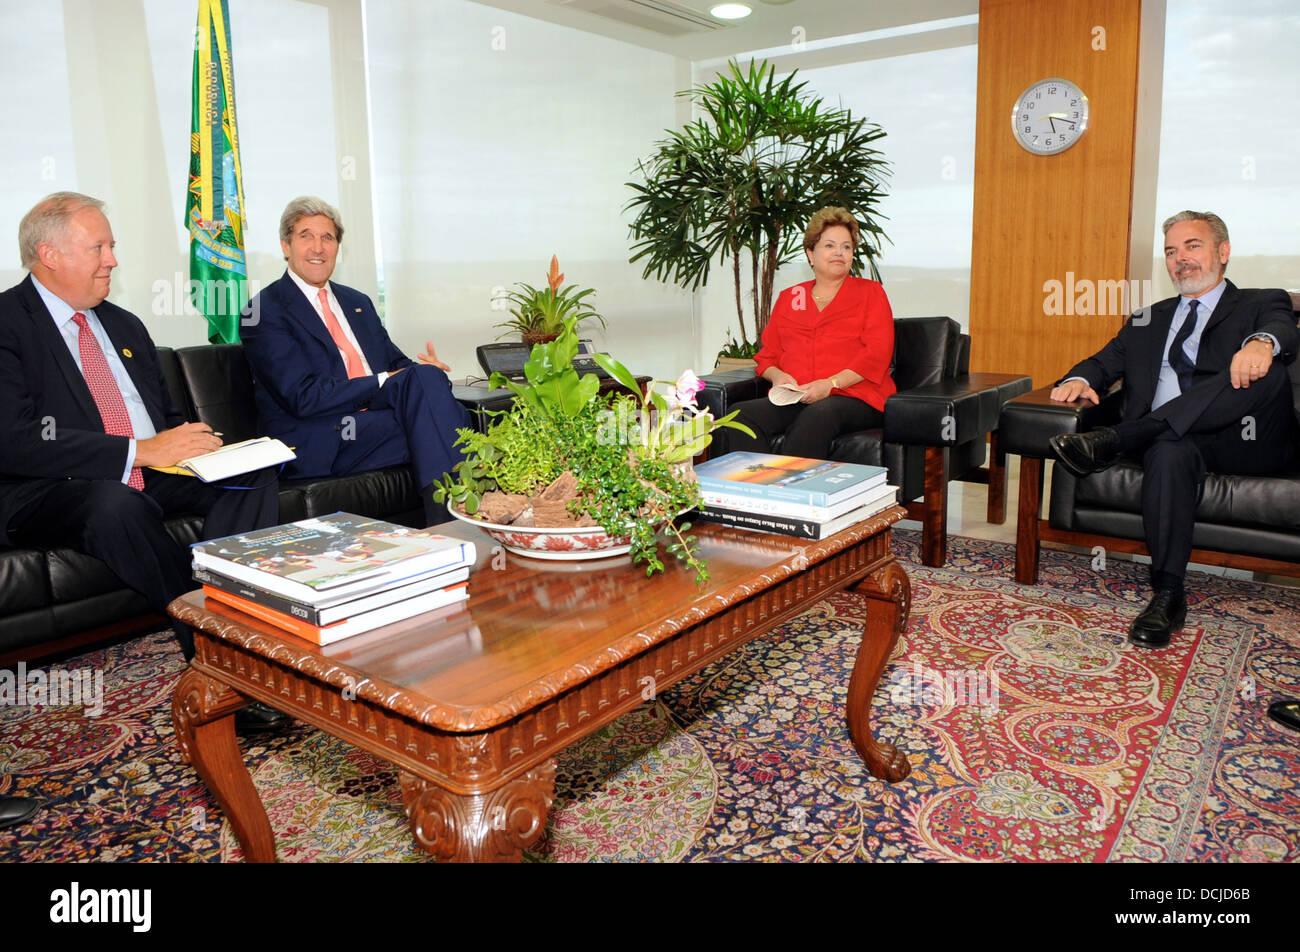 john kerry johnkerry dilma rousseff dilmarousseff thomas shannon thomasshannon antonio patriota antoniopatriota - Stock Image